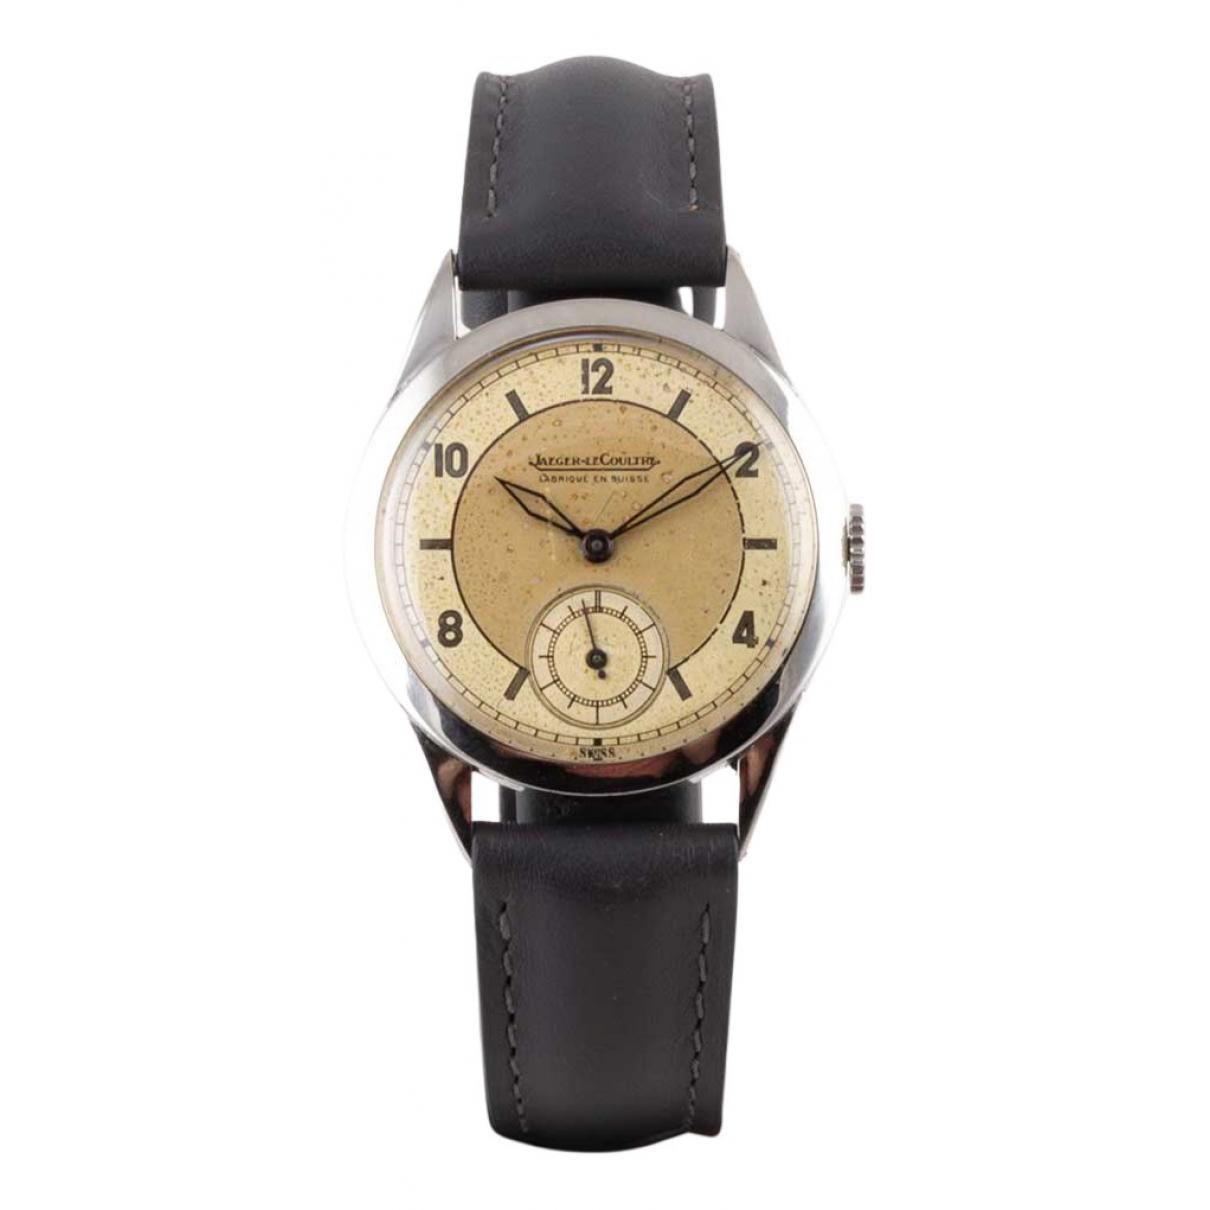 Jaeger-lecoultre Vintage Silver Steel watch for Men N